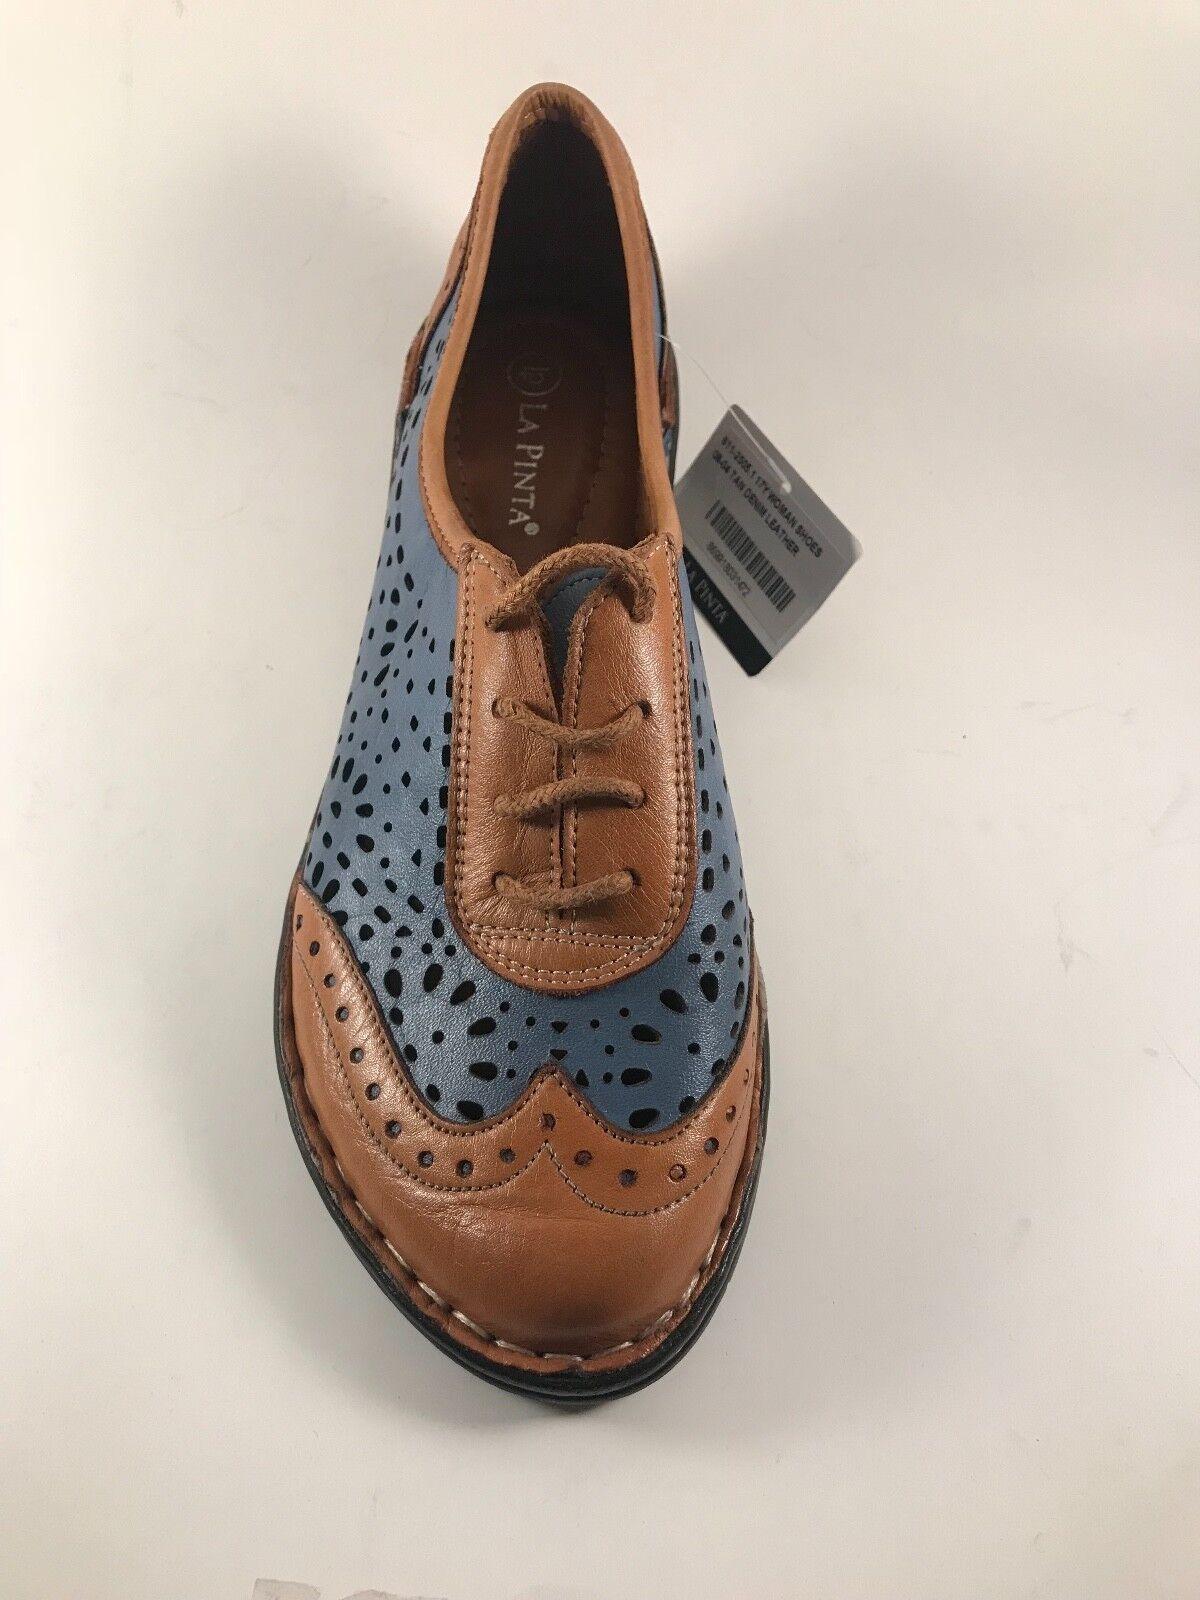 La Pinta 611-2505 Tan Tan Tan Denim Leather Lace Up Lightweight shoes Size 37(US 6.5-7) 82ddb5